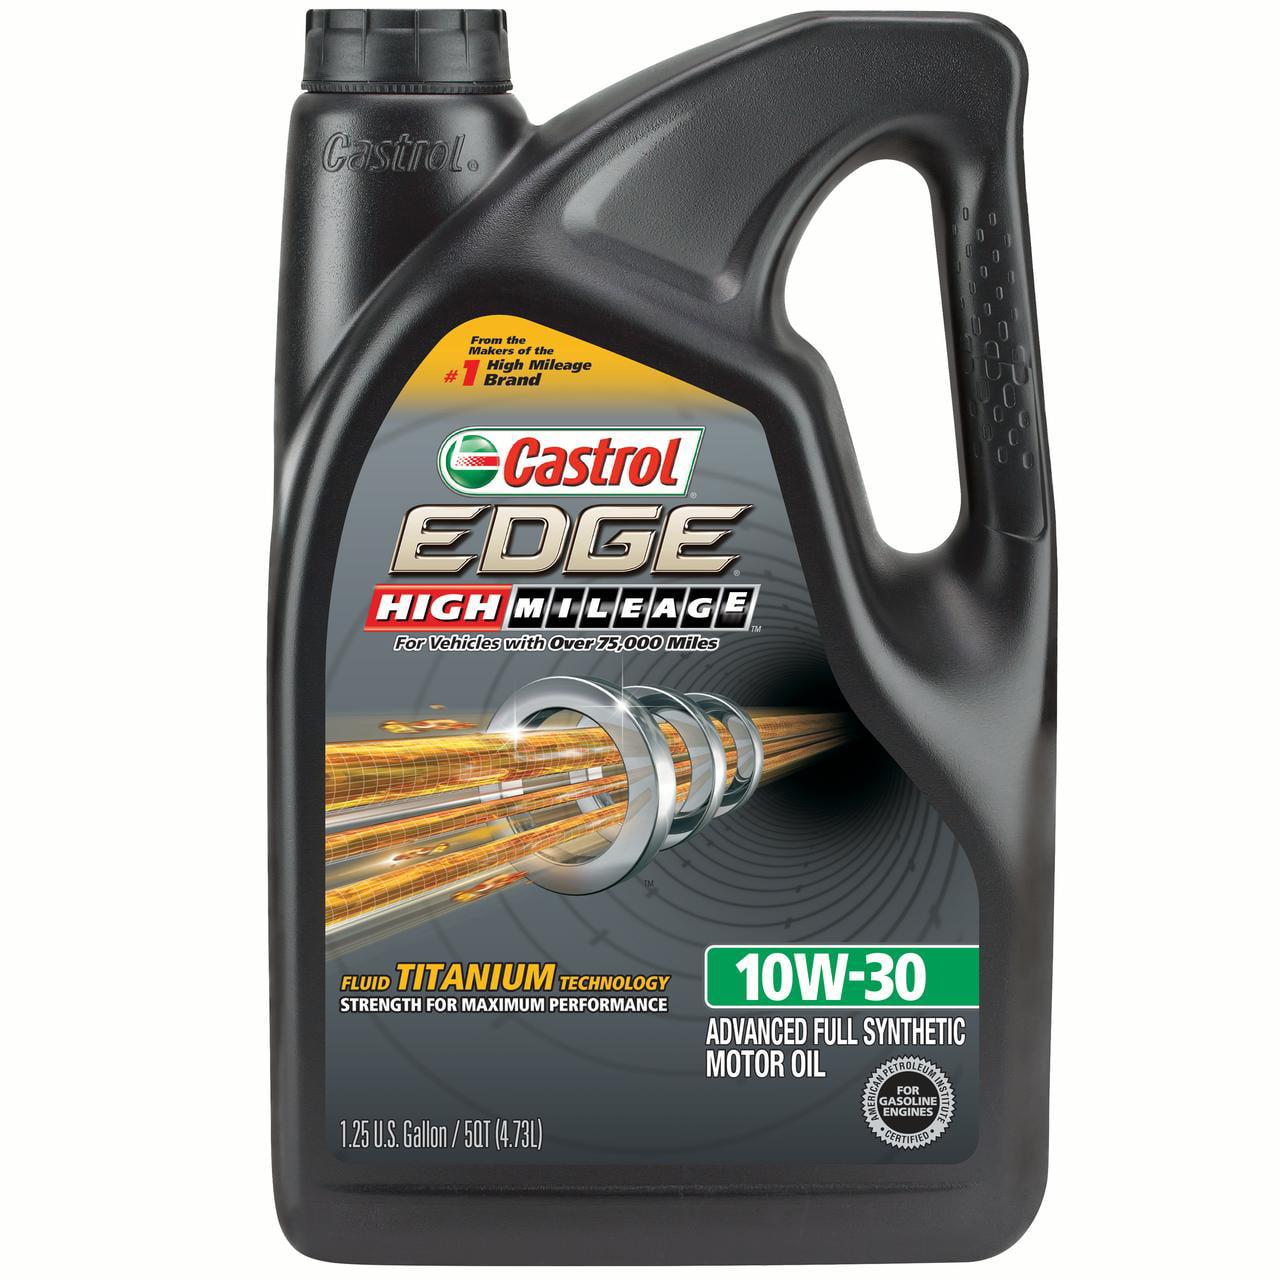 Castrol Edge High Mileage 10W-30 Advanced Full Synthetic Motor Oil, 5 qt by Castrol